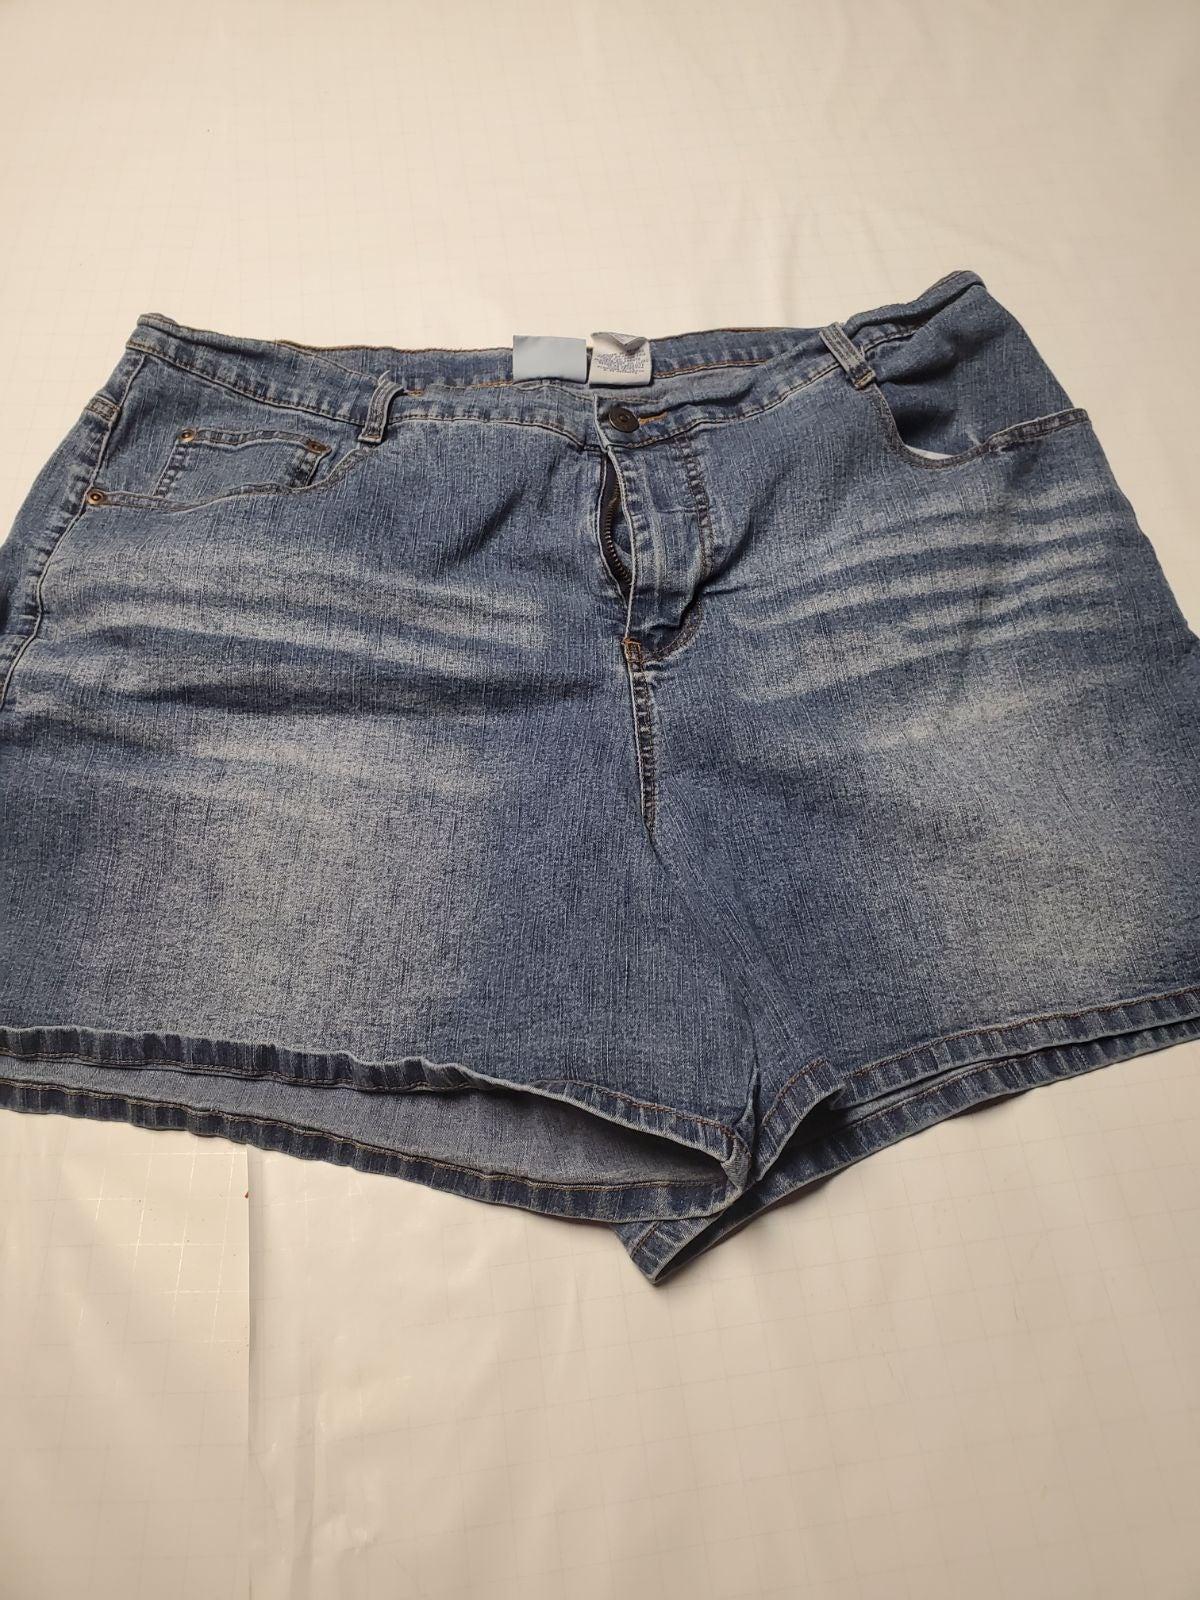 Plus size denim shorts